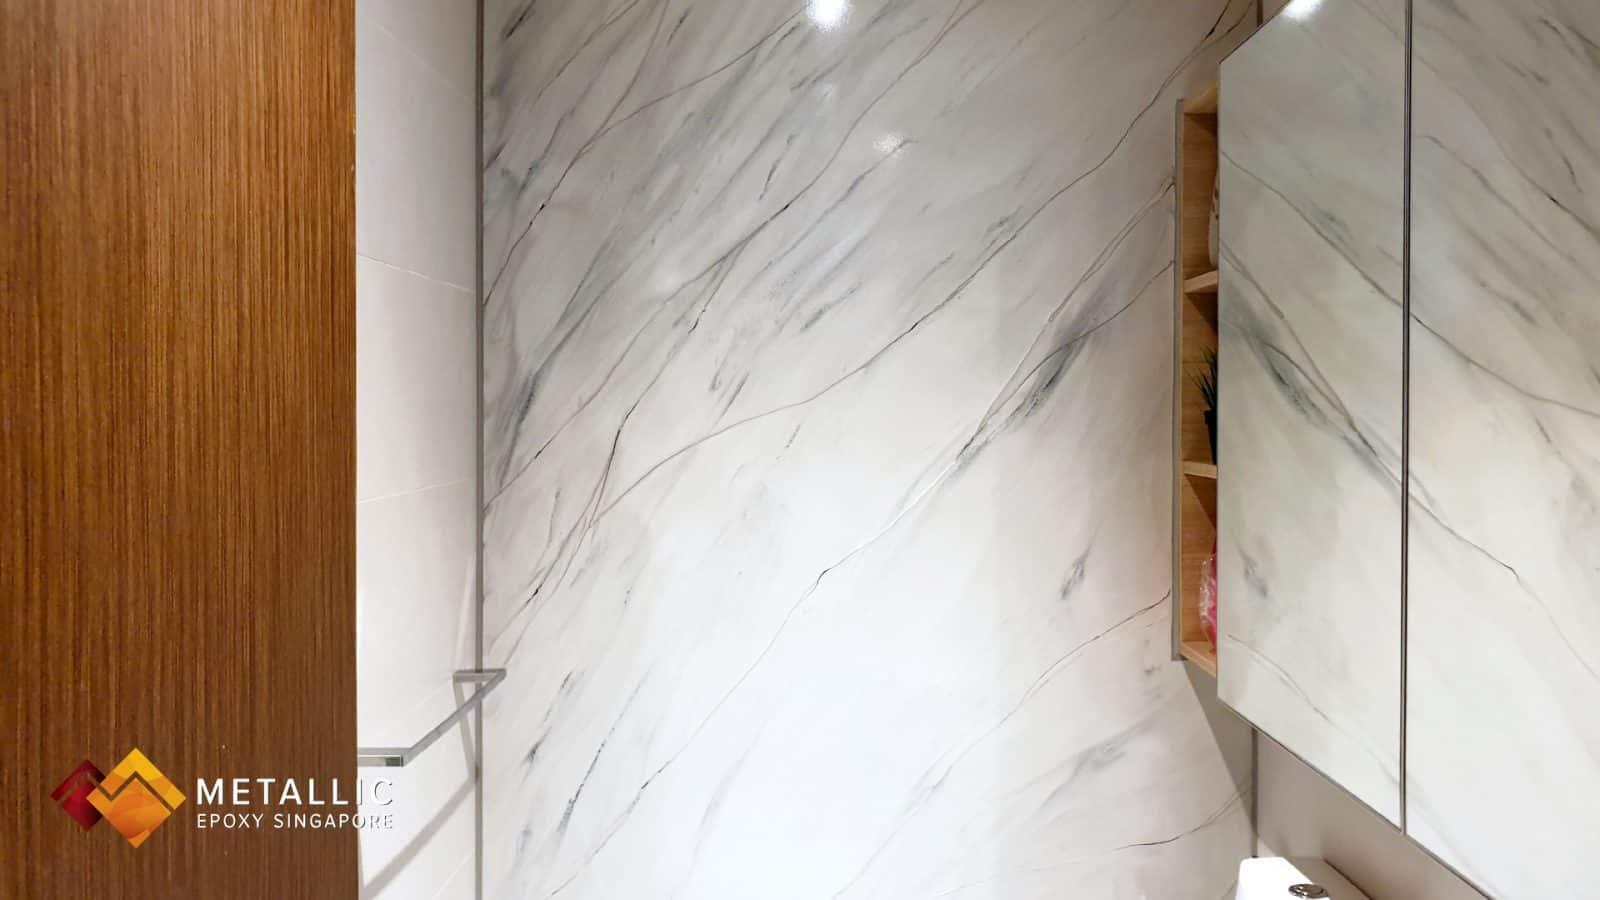 metallic epoxy singapore light grey marble bathroom design